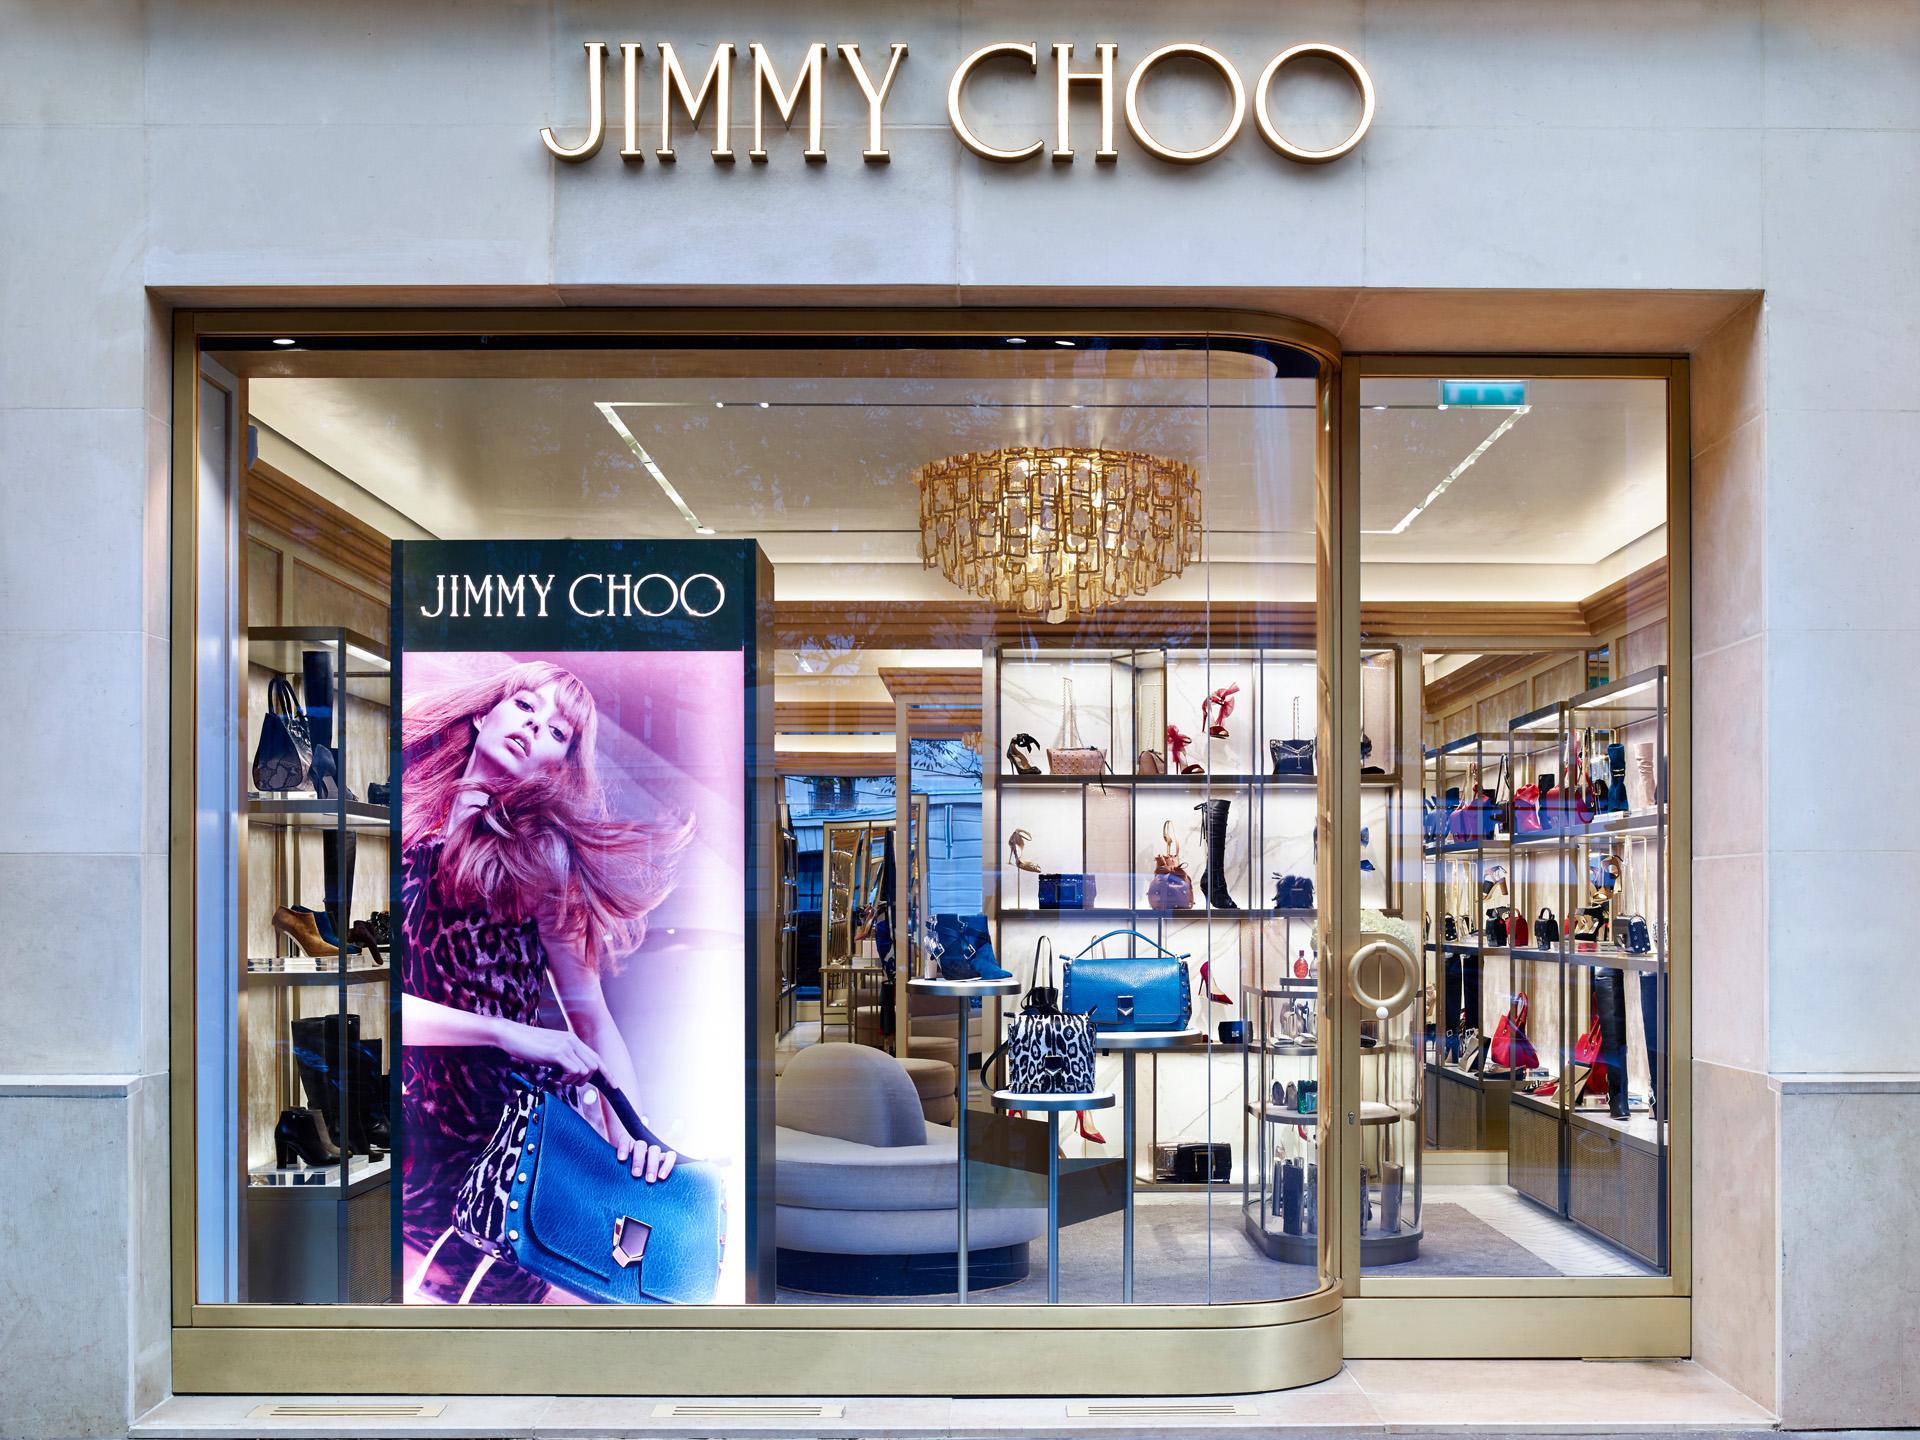 daf8f74c8ab Jimmy Choo Paris Avenue Montaigne